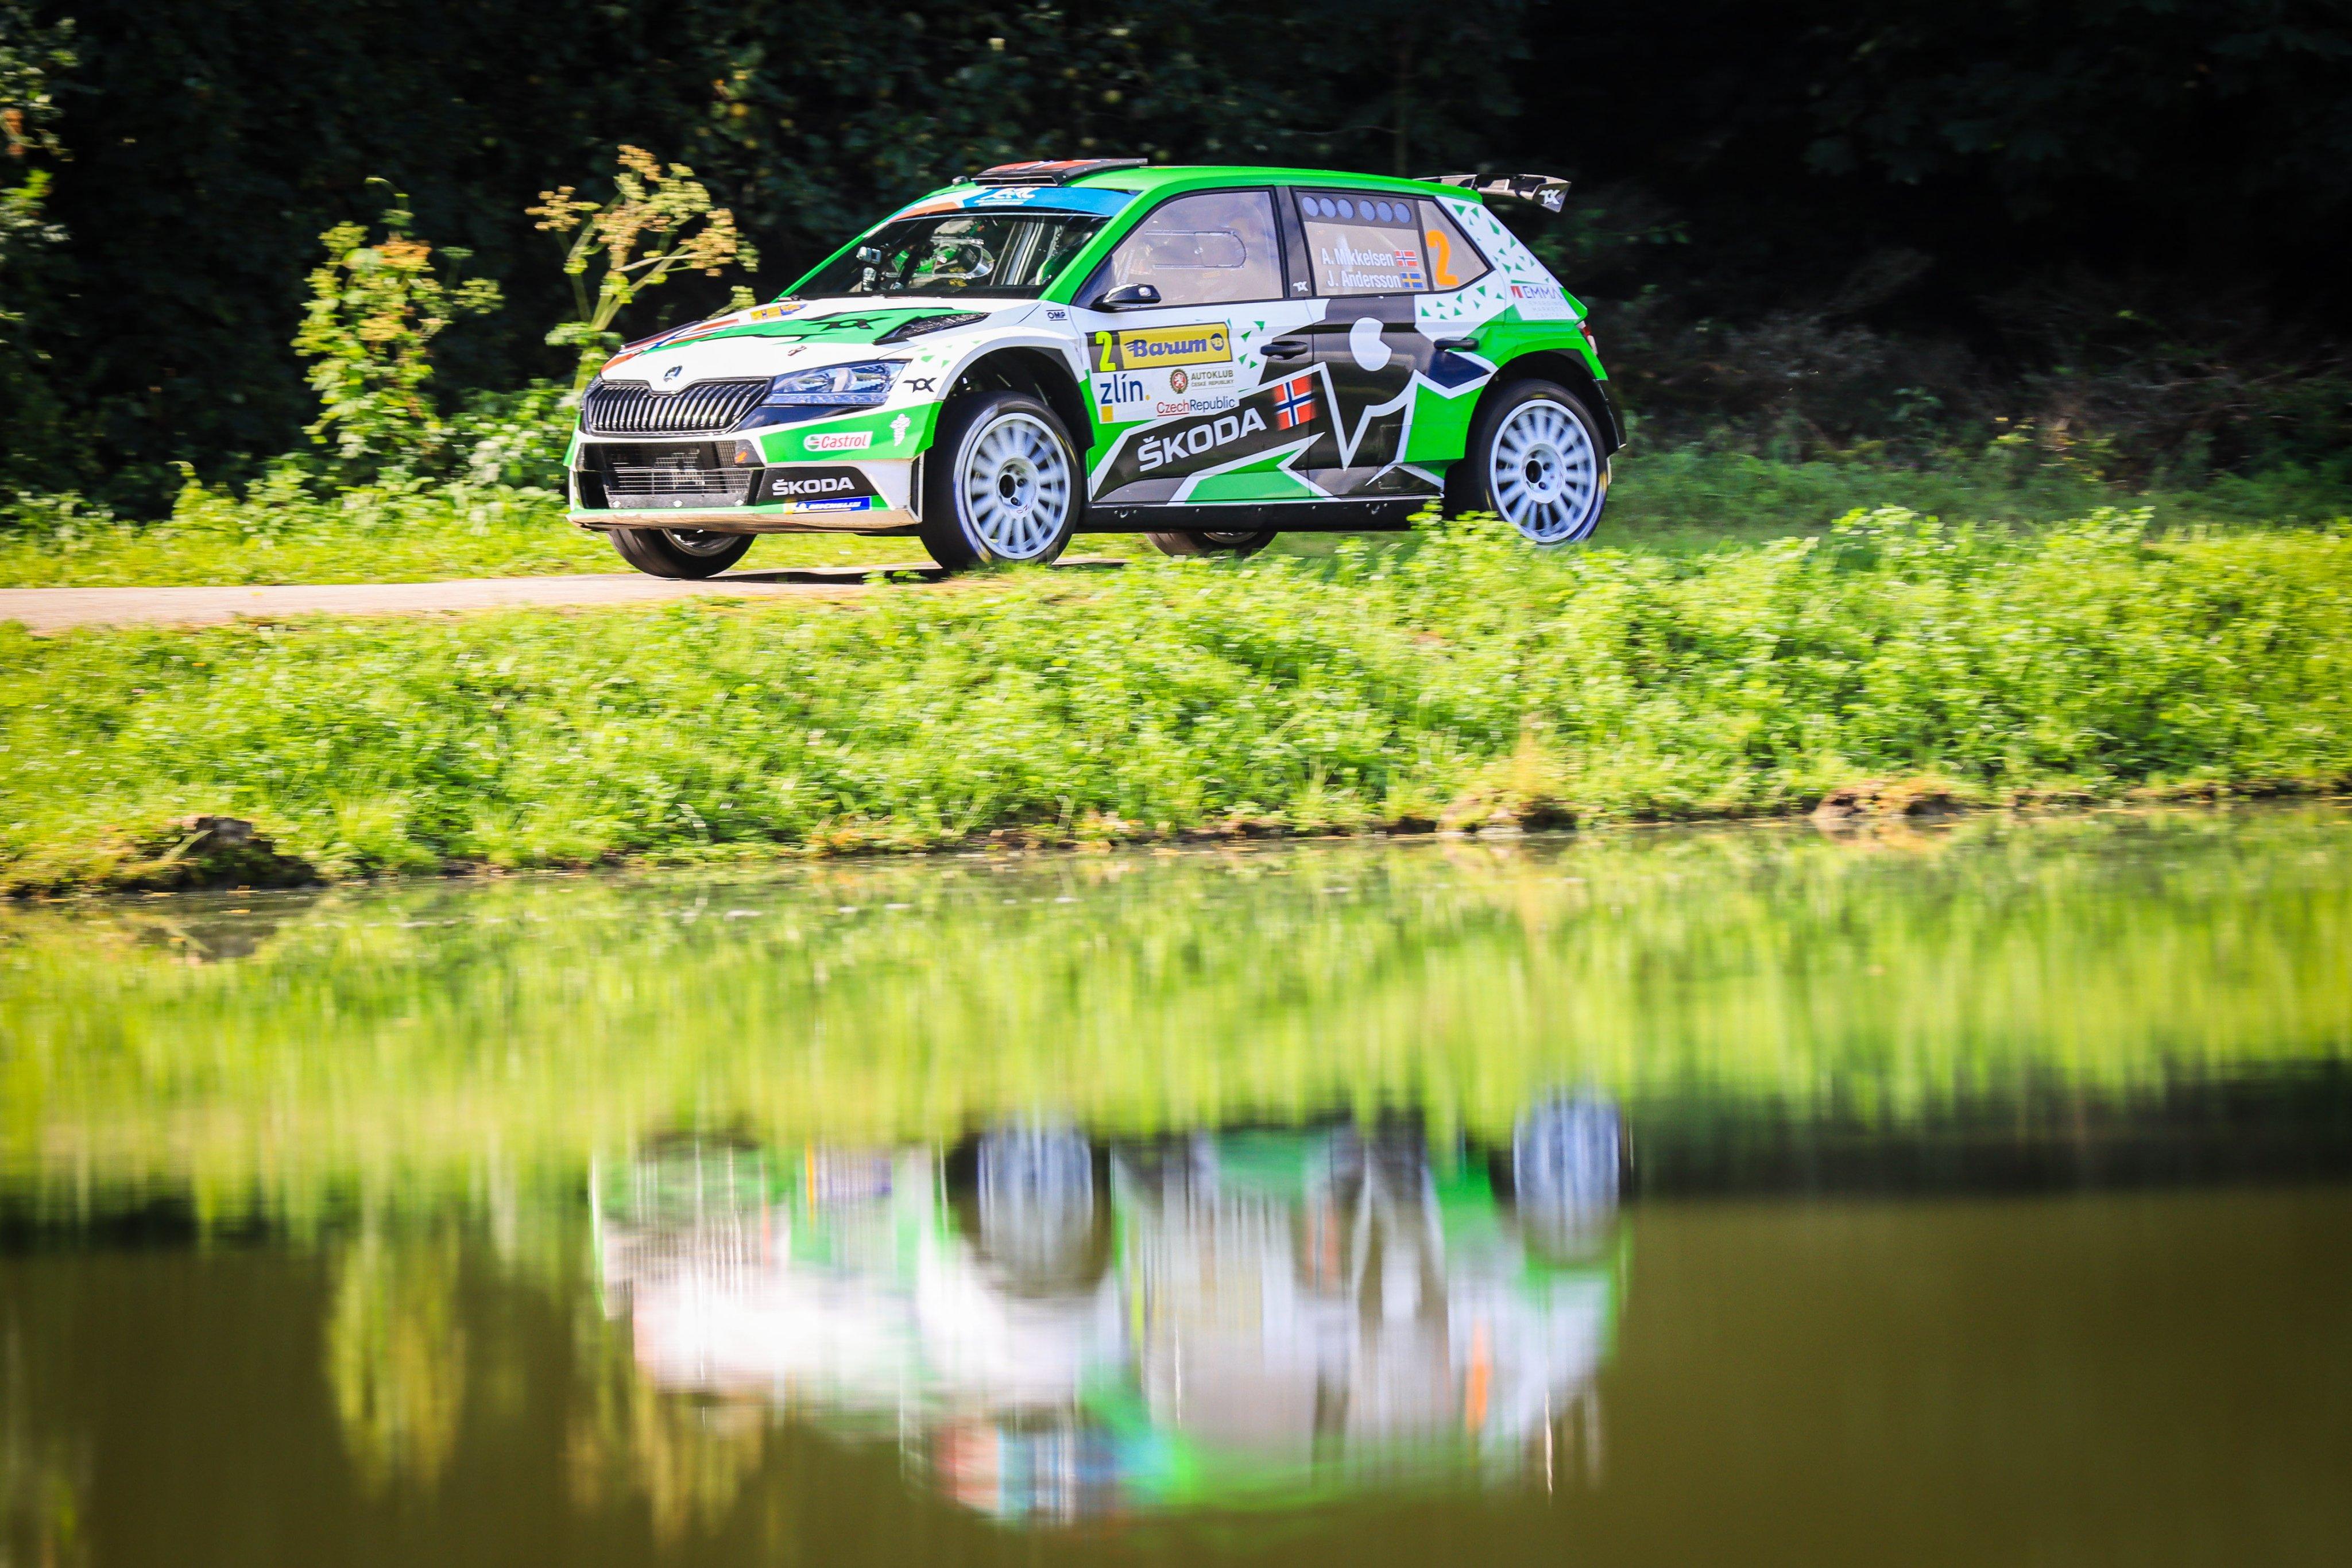 ERC: 50º Barum Czech Rally Zlin [27-29 Agosto] - Página 2 E95mL3yXoAQg4cg?format=jpg&name=4096x4096